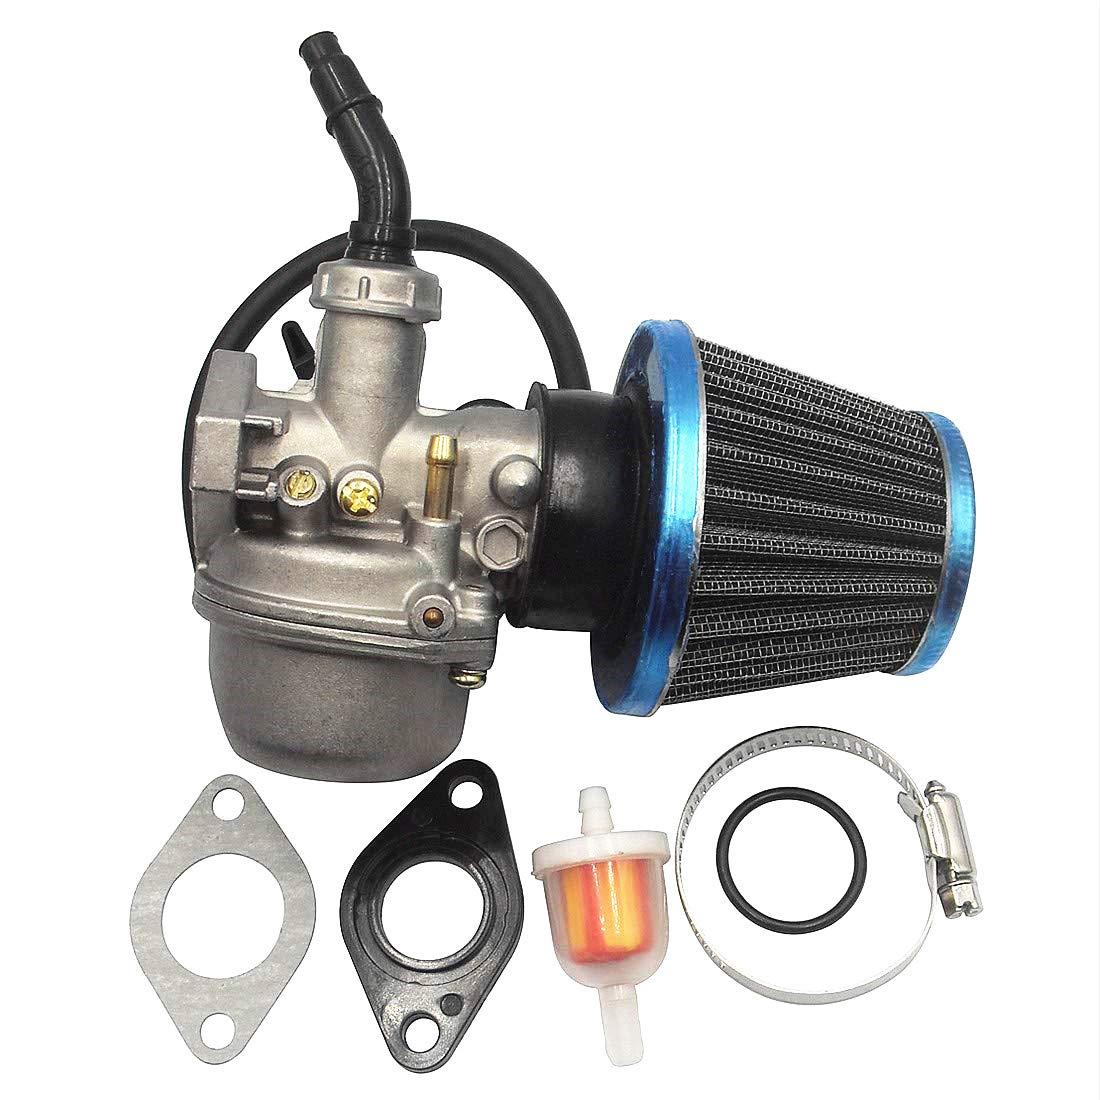 ATV Carburetor PZ19 with 35mm Air Filter Fuel Filter for/Taotao ATV Dirt Pit Bike Honda CRF By LIAMTU 50cc/70cc 80cc 90cc 110cc 125cc